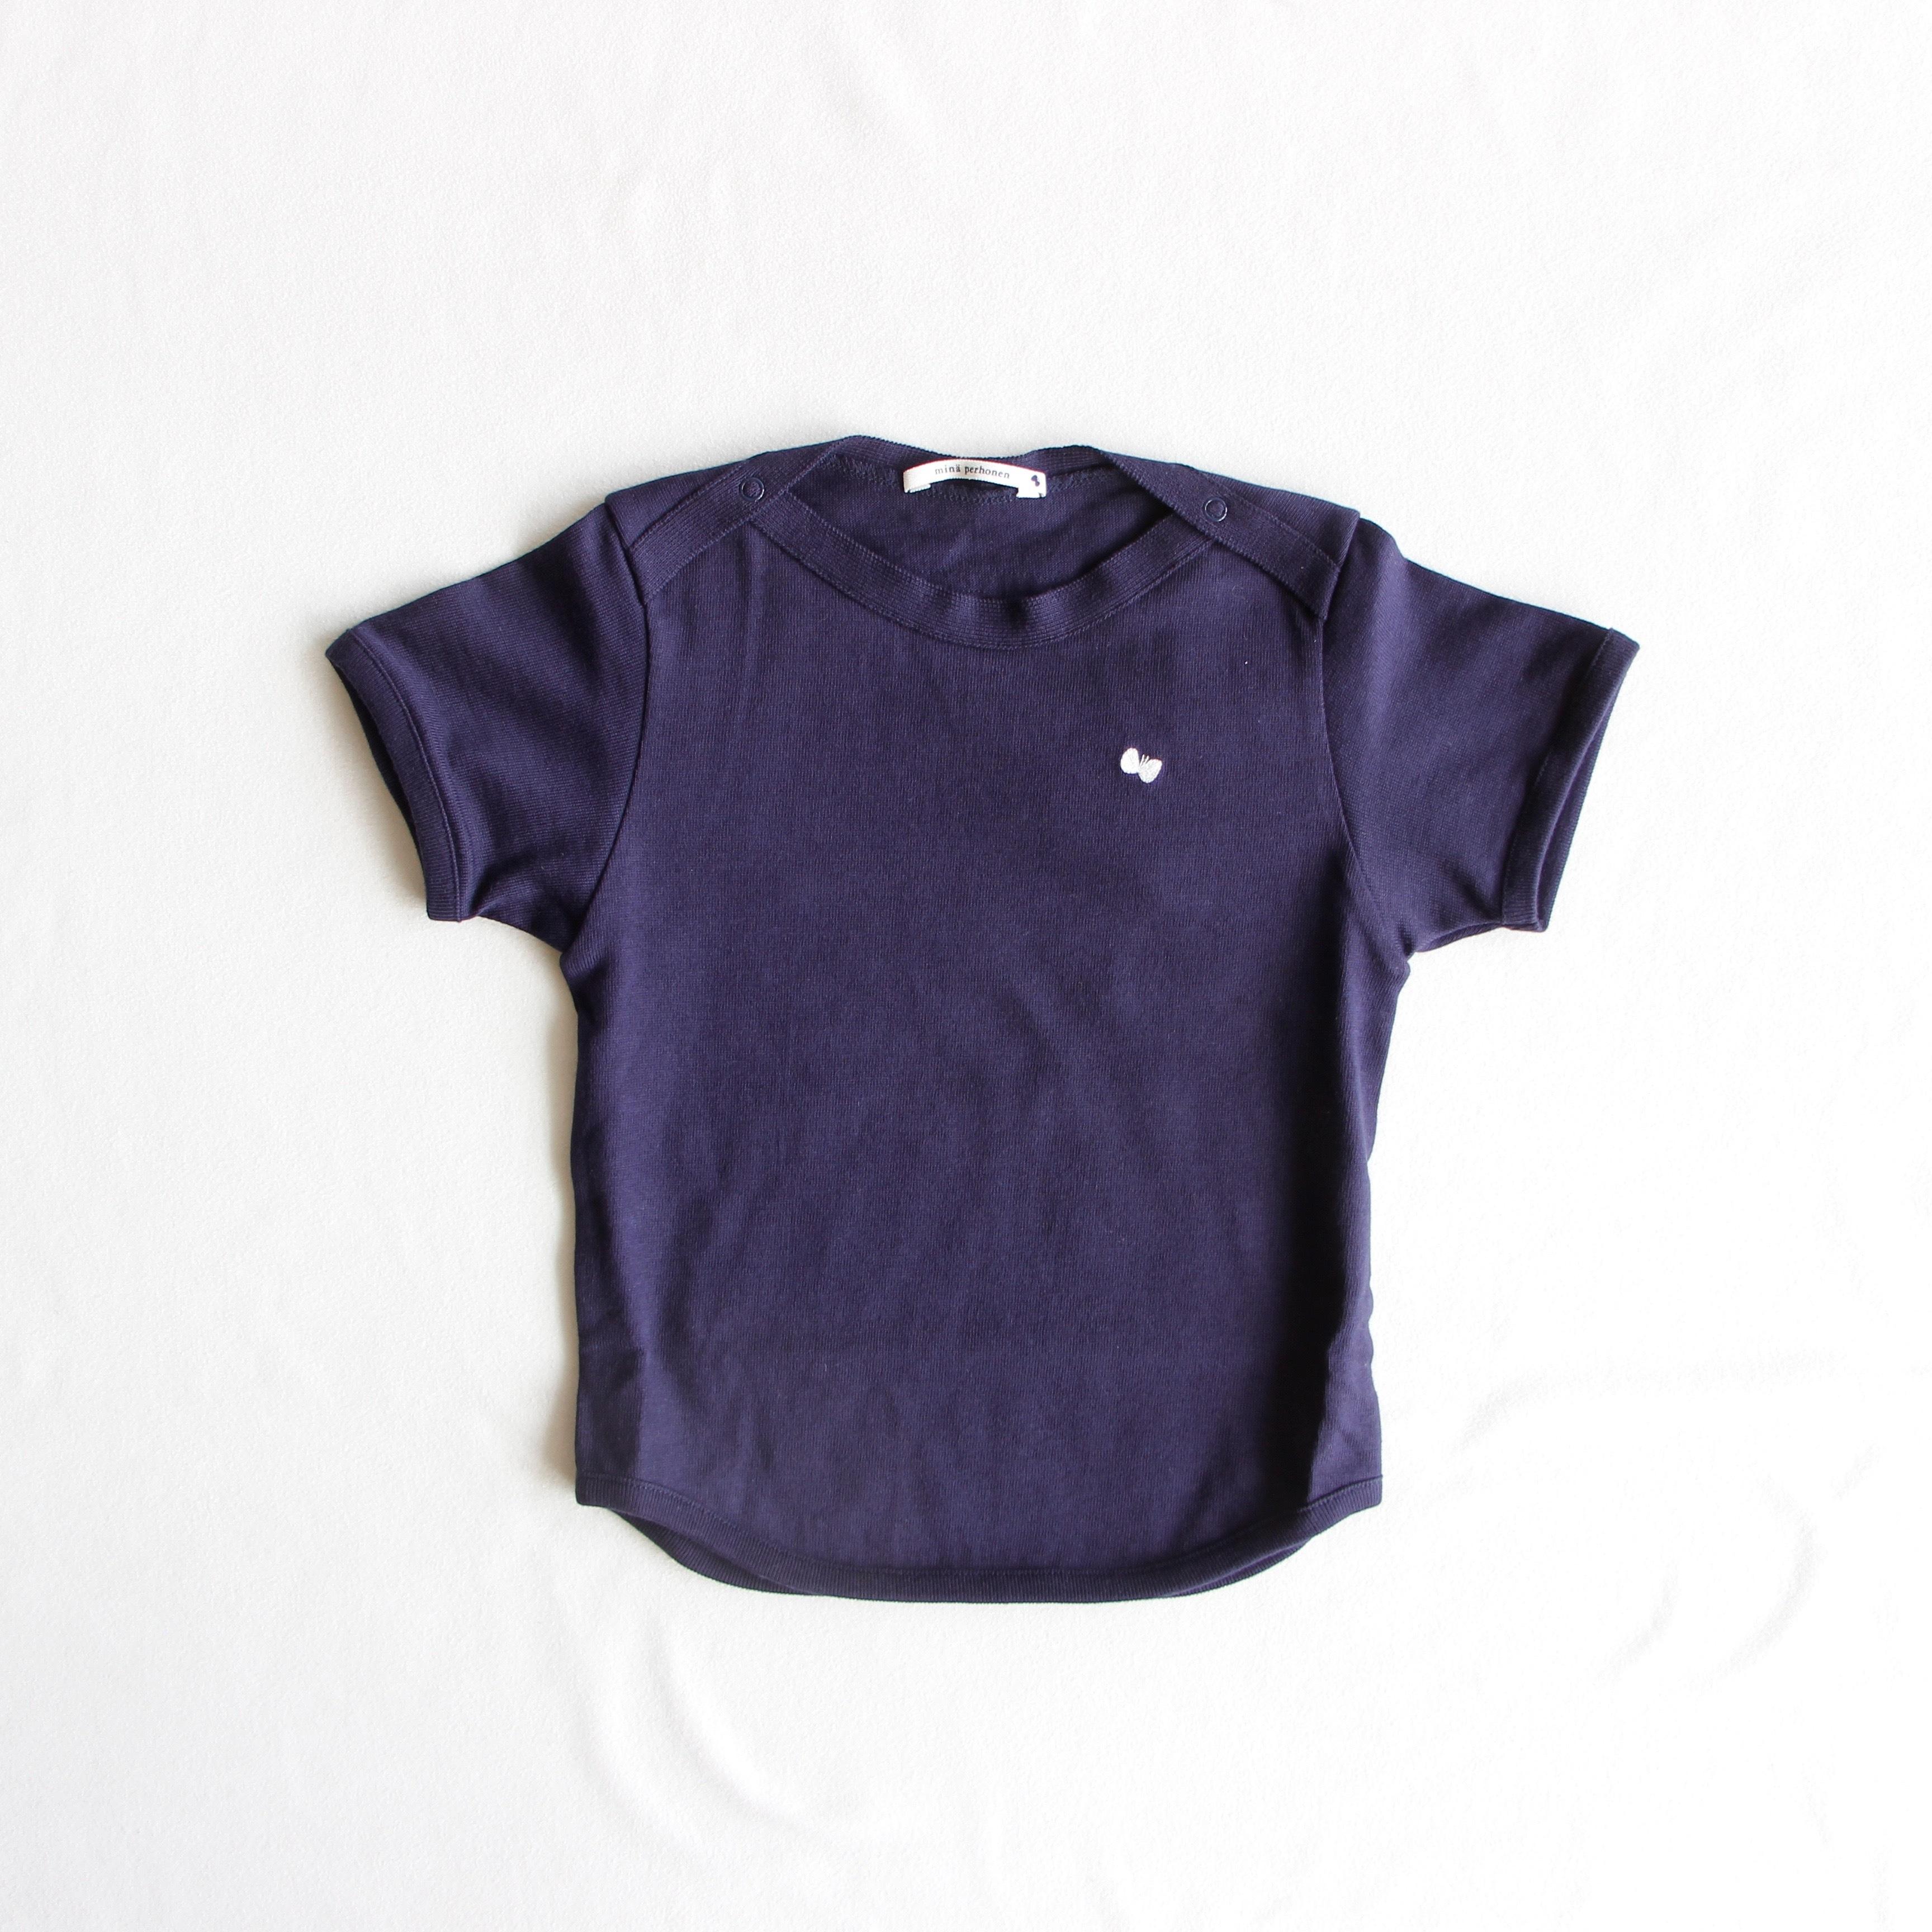 《mina perhonen》zutto Tシャツ / navy / 110cm